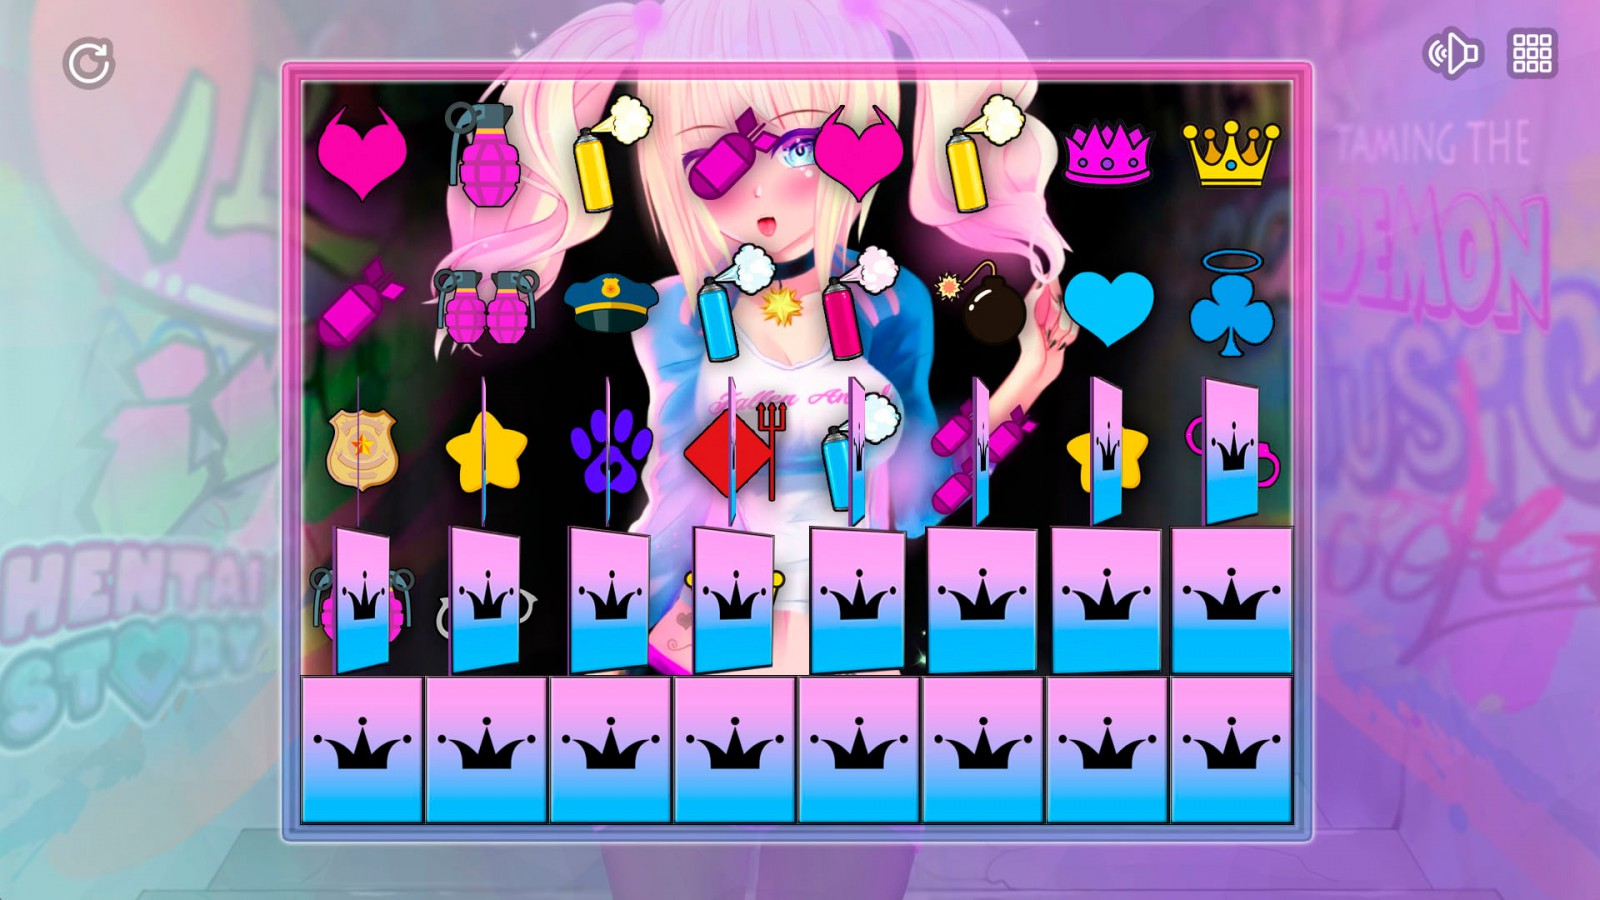 Sweet Story Bad Girlのサンプル画像5